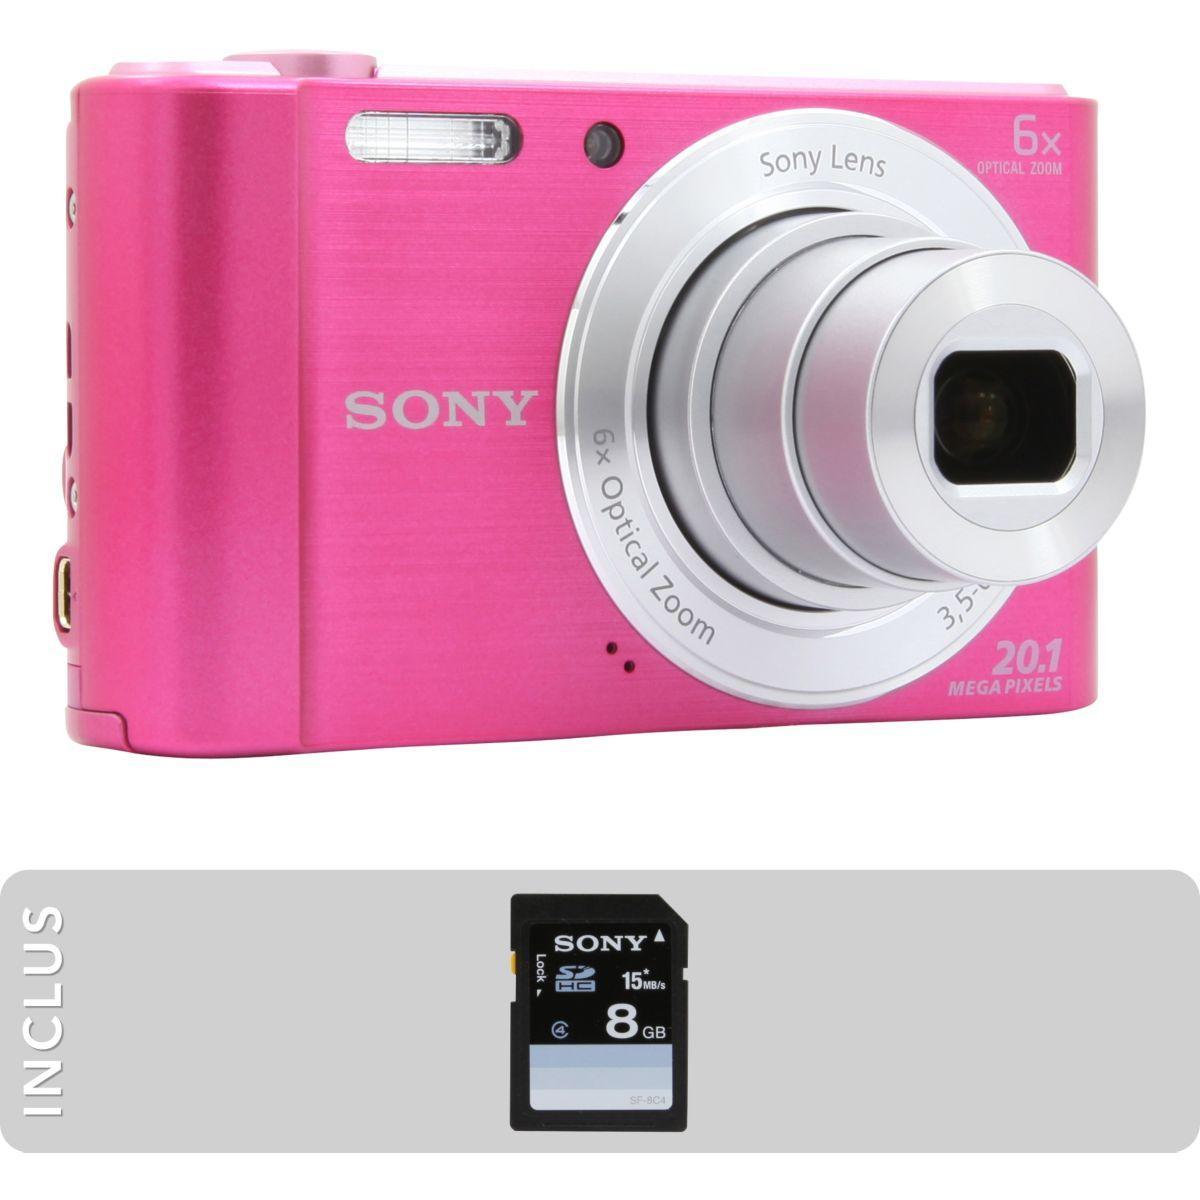 Appareil photo compact sony pack dsc-w810 rose + sd 8go - livraison offerte : code livphoto (photo)